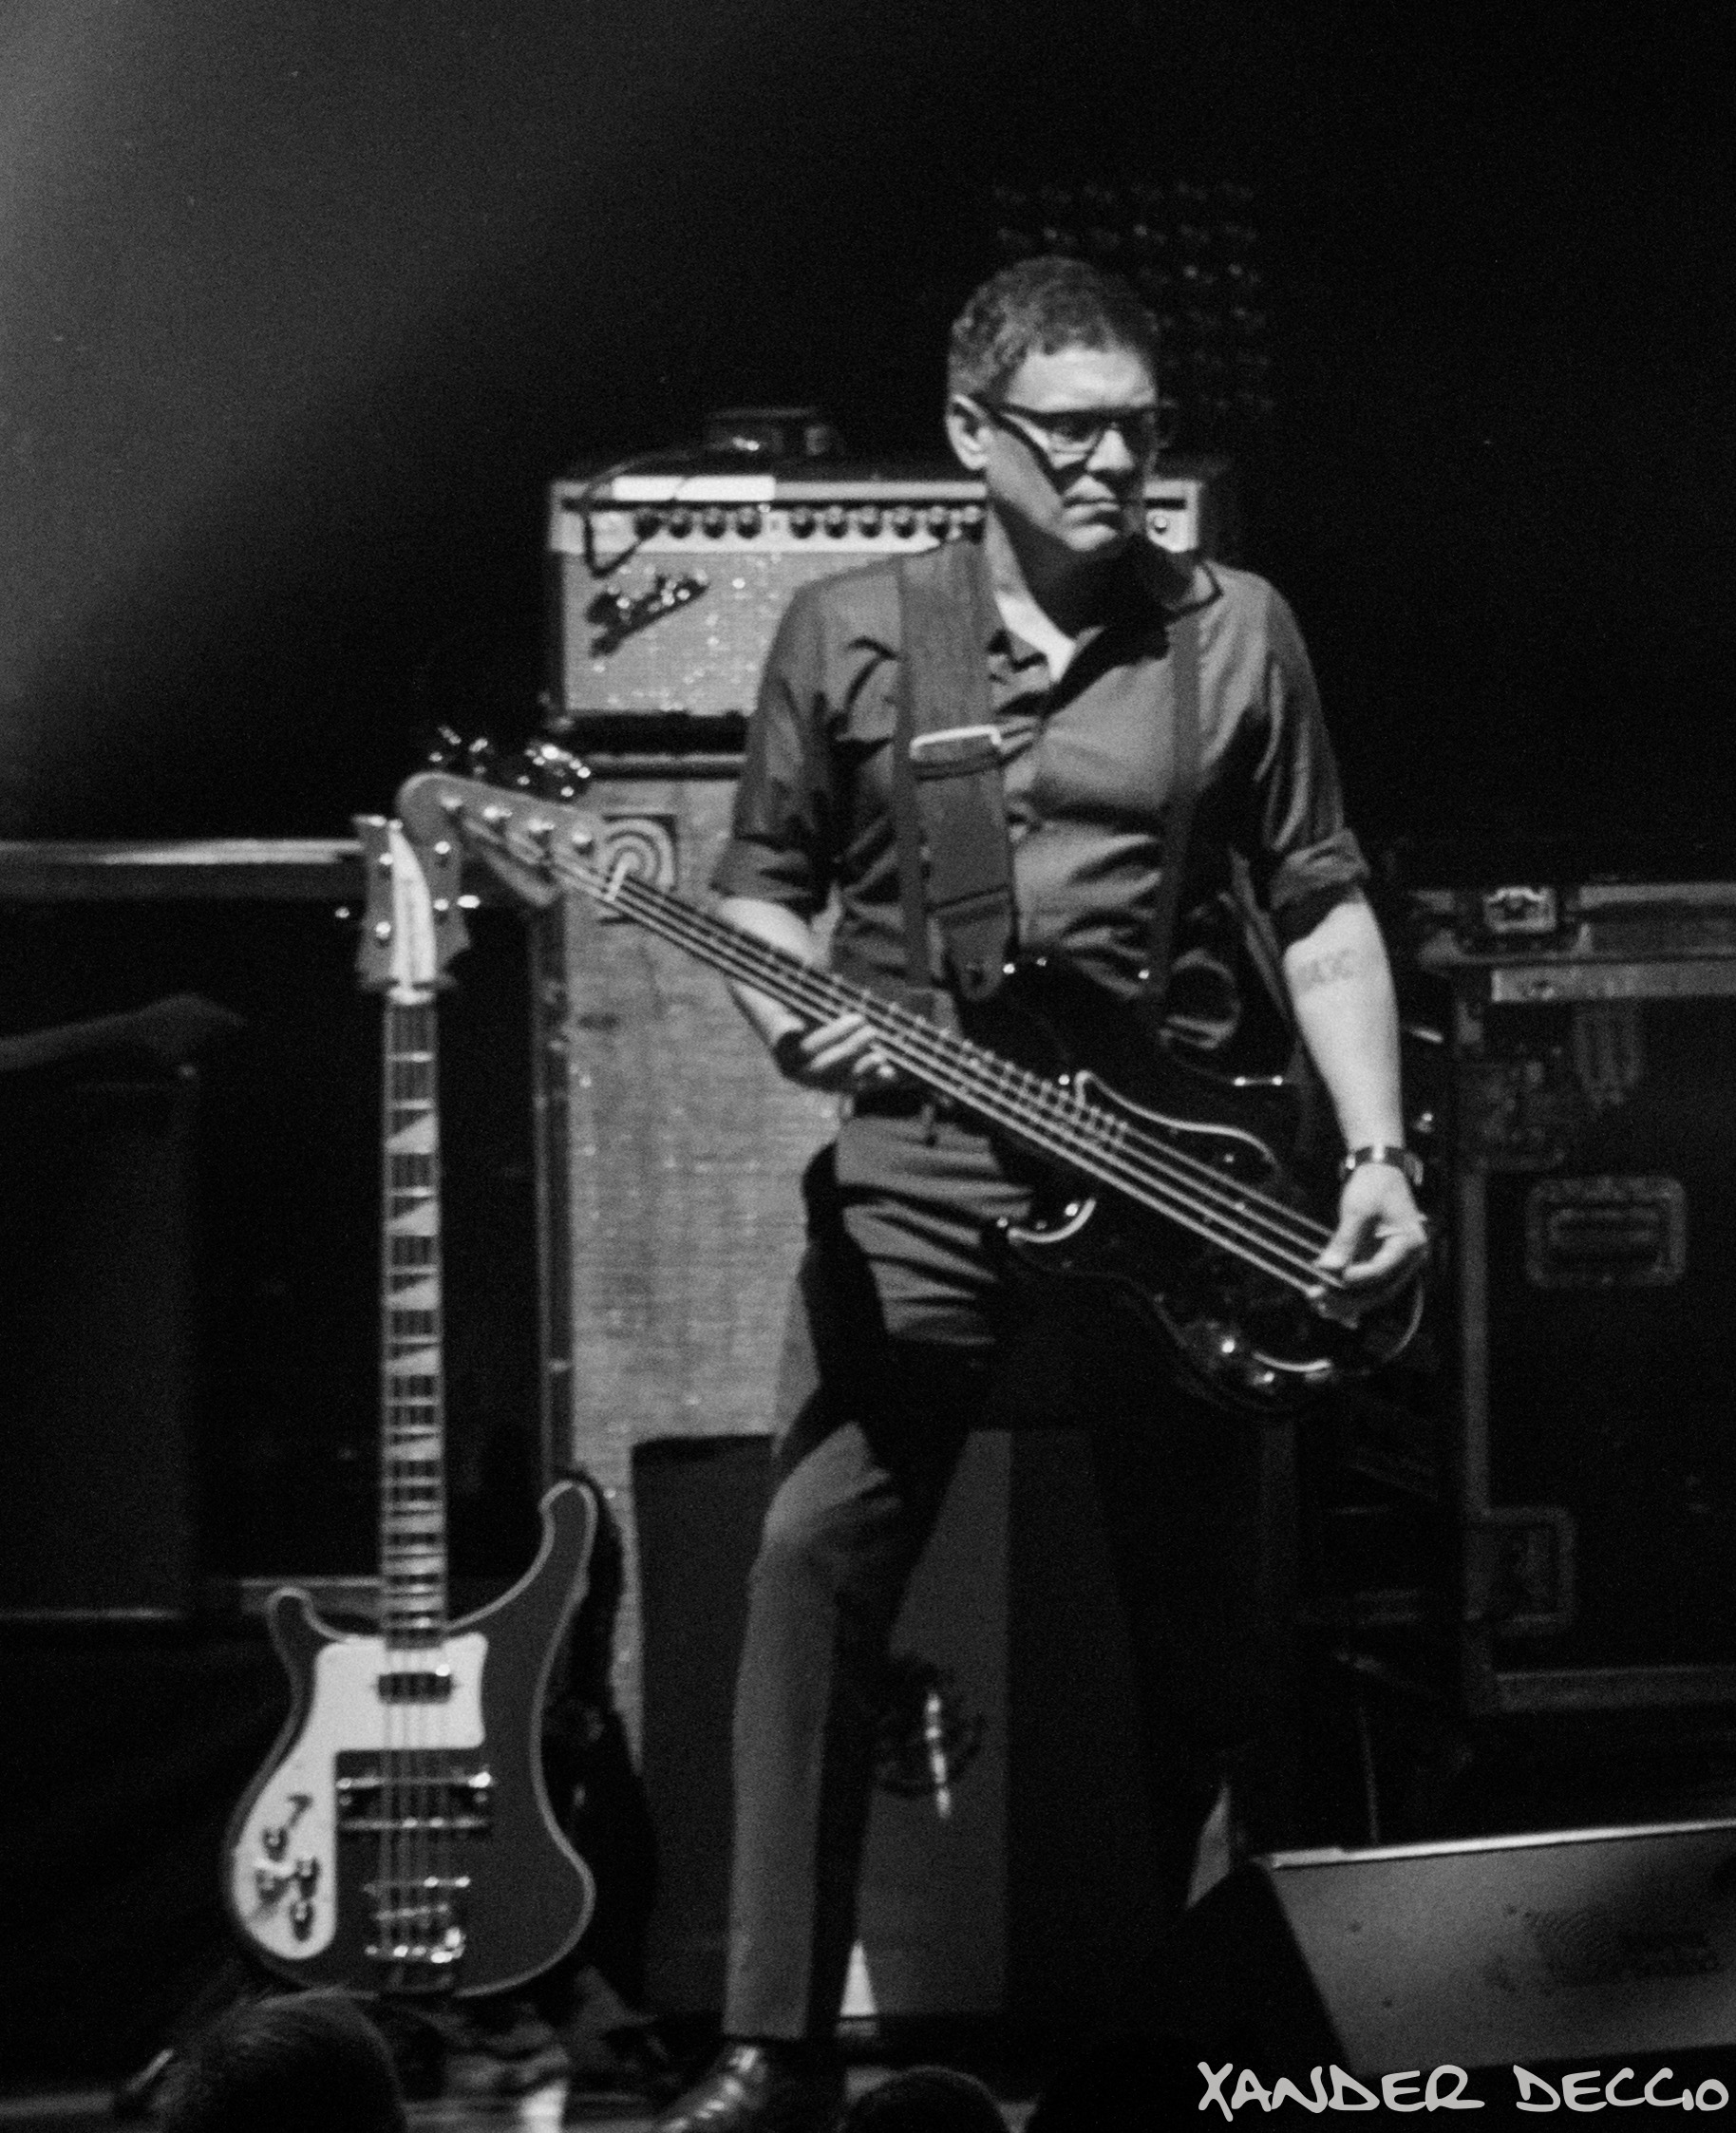 Morrissey Back In Great Form At Benaroya Hall Smi Seattle Music Insider